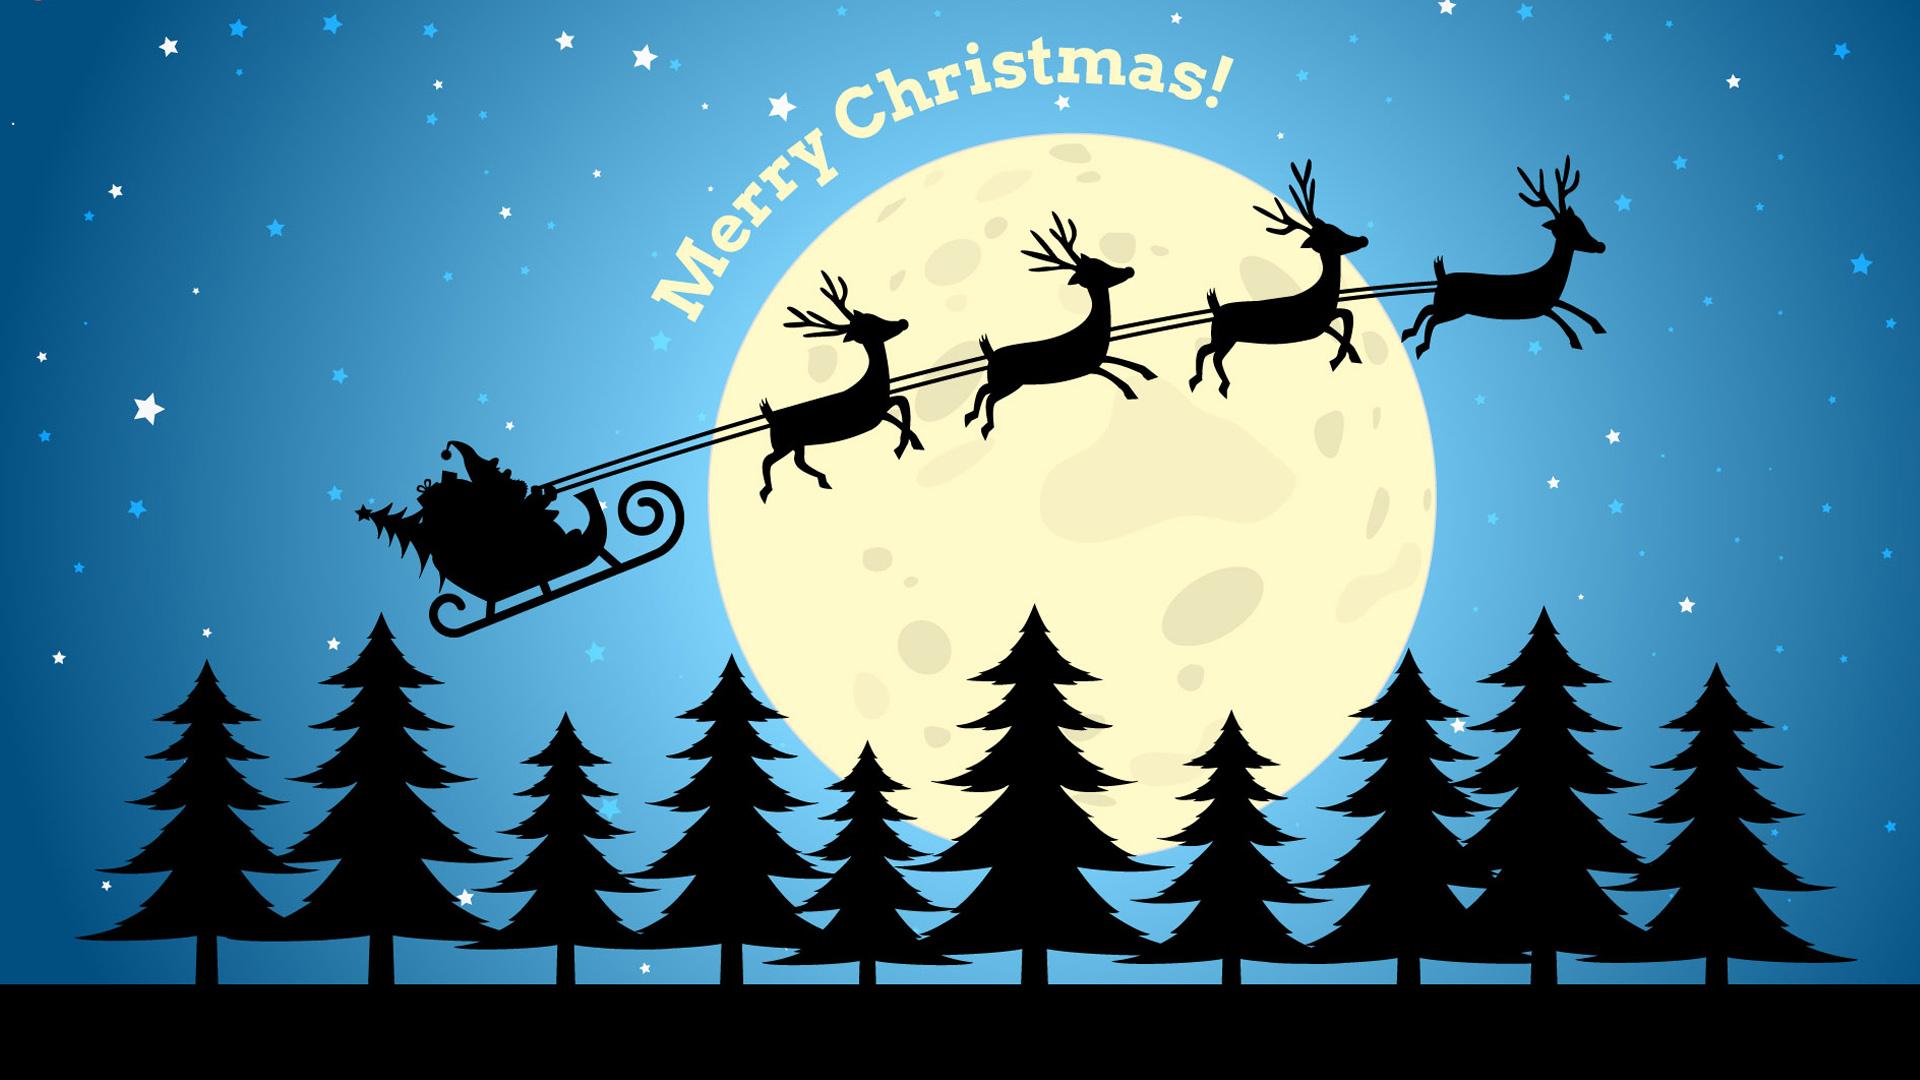 Merry Christmas Wallpaper 2014-2015